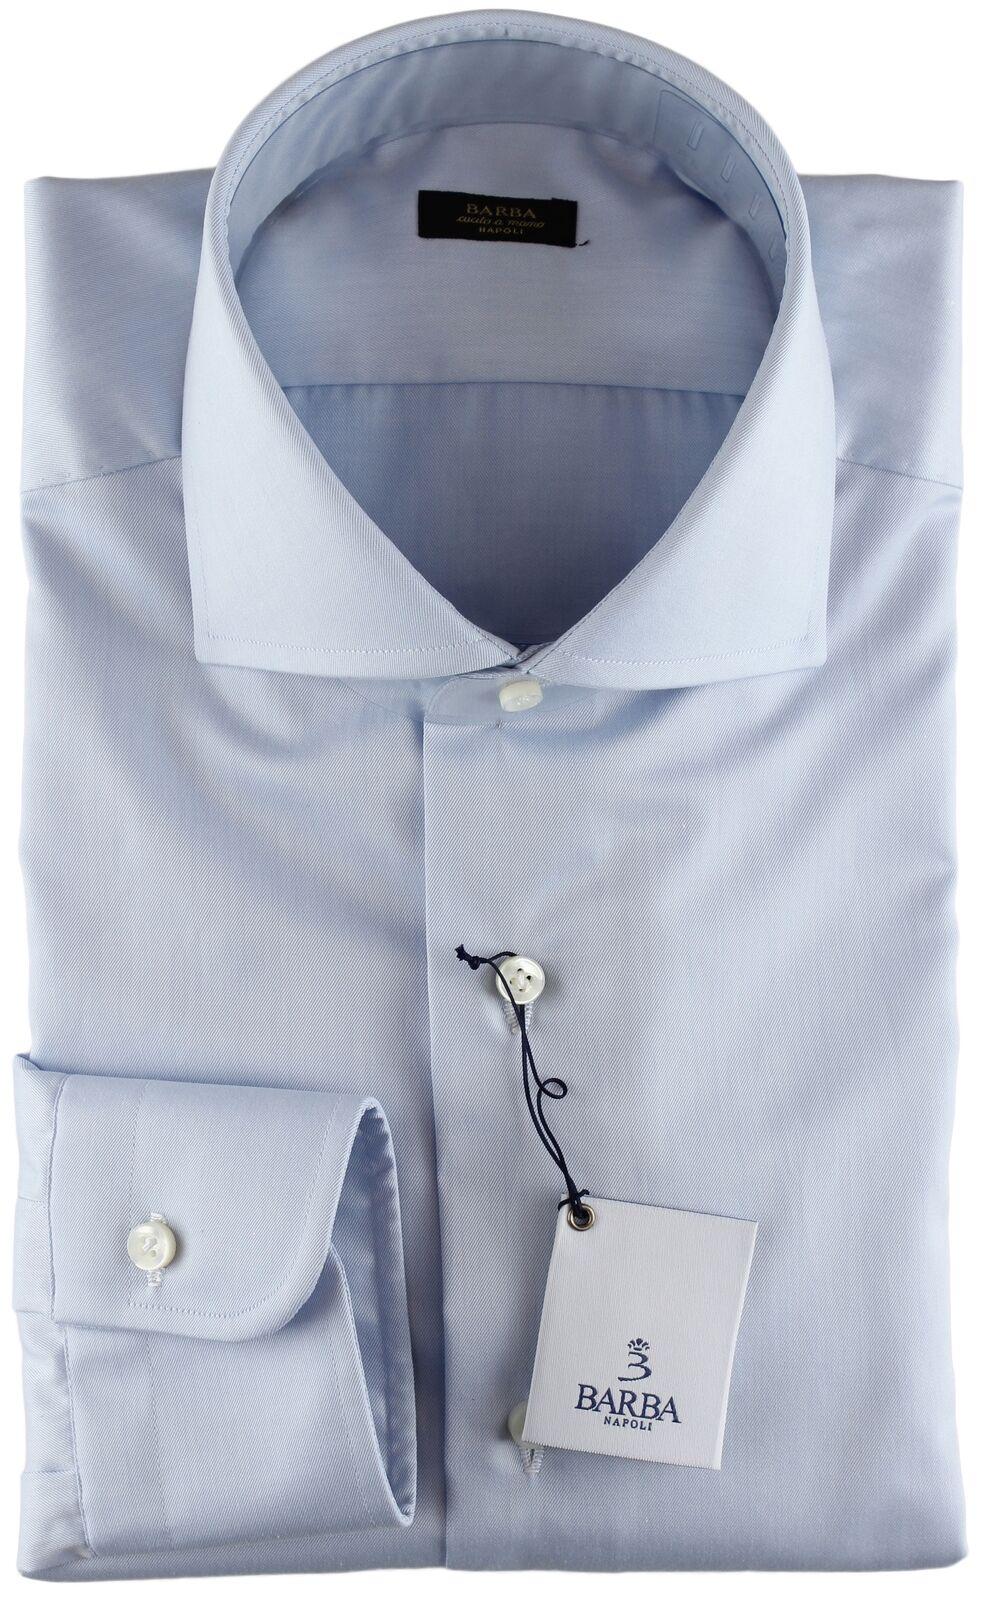 NWT BARBA NAPOLI DRESS SHIRT gold label sky Blau twill handmade 39 15 1/2